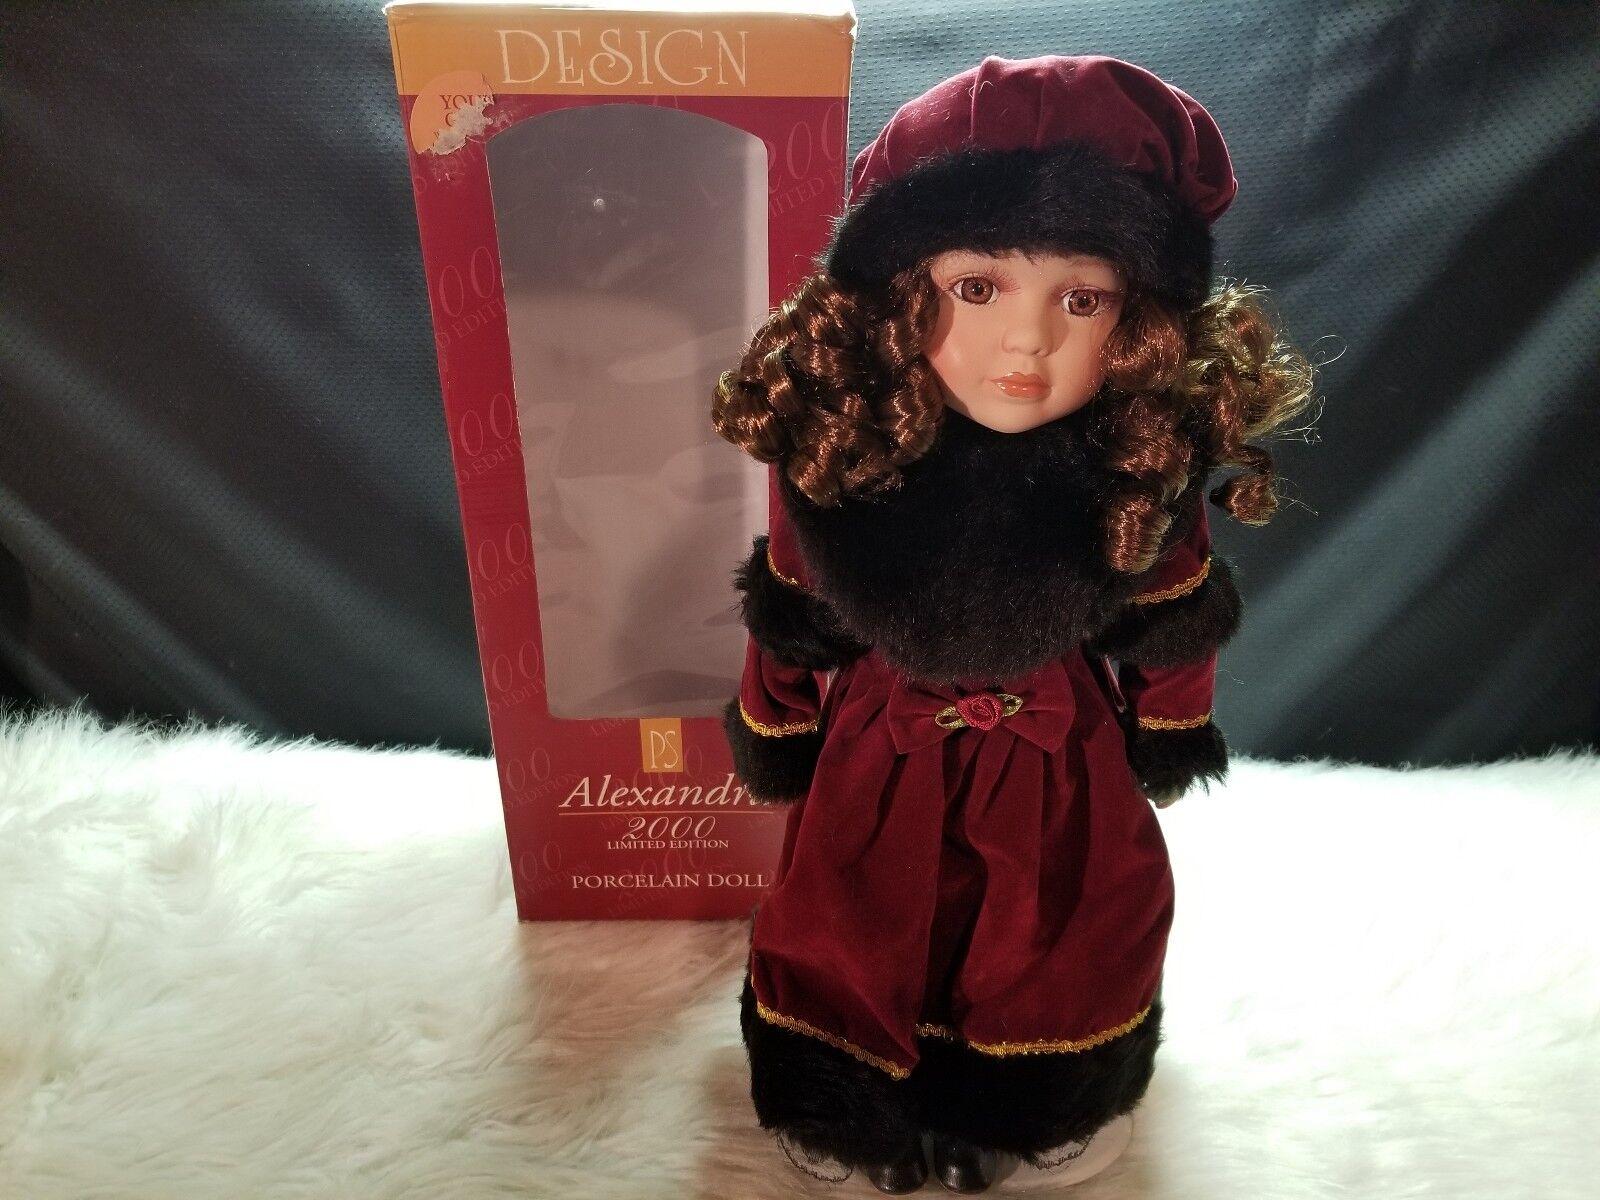 Alexandra 2000 Limited Edition Porcelain Doll